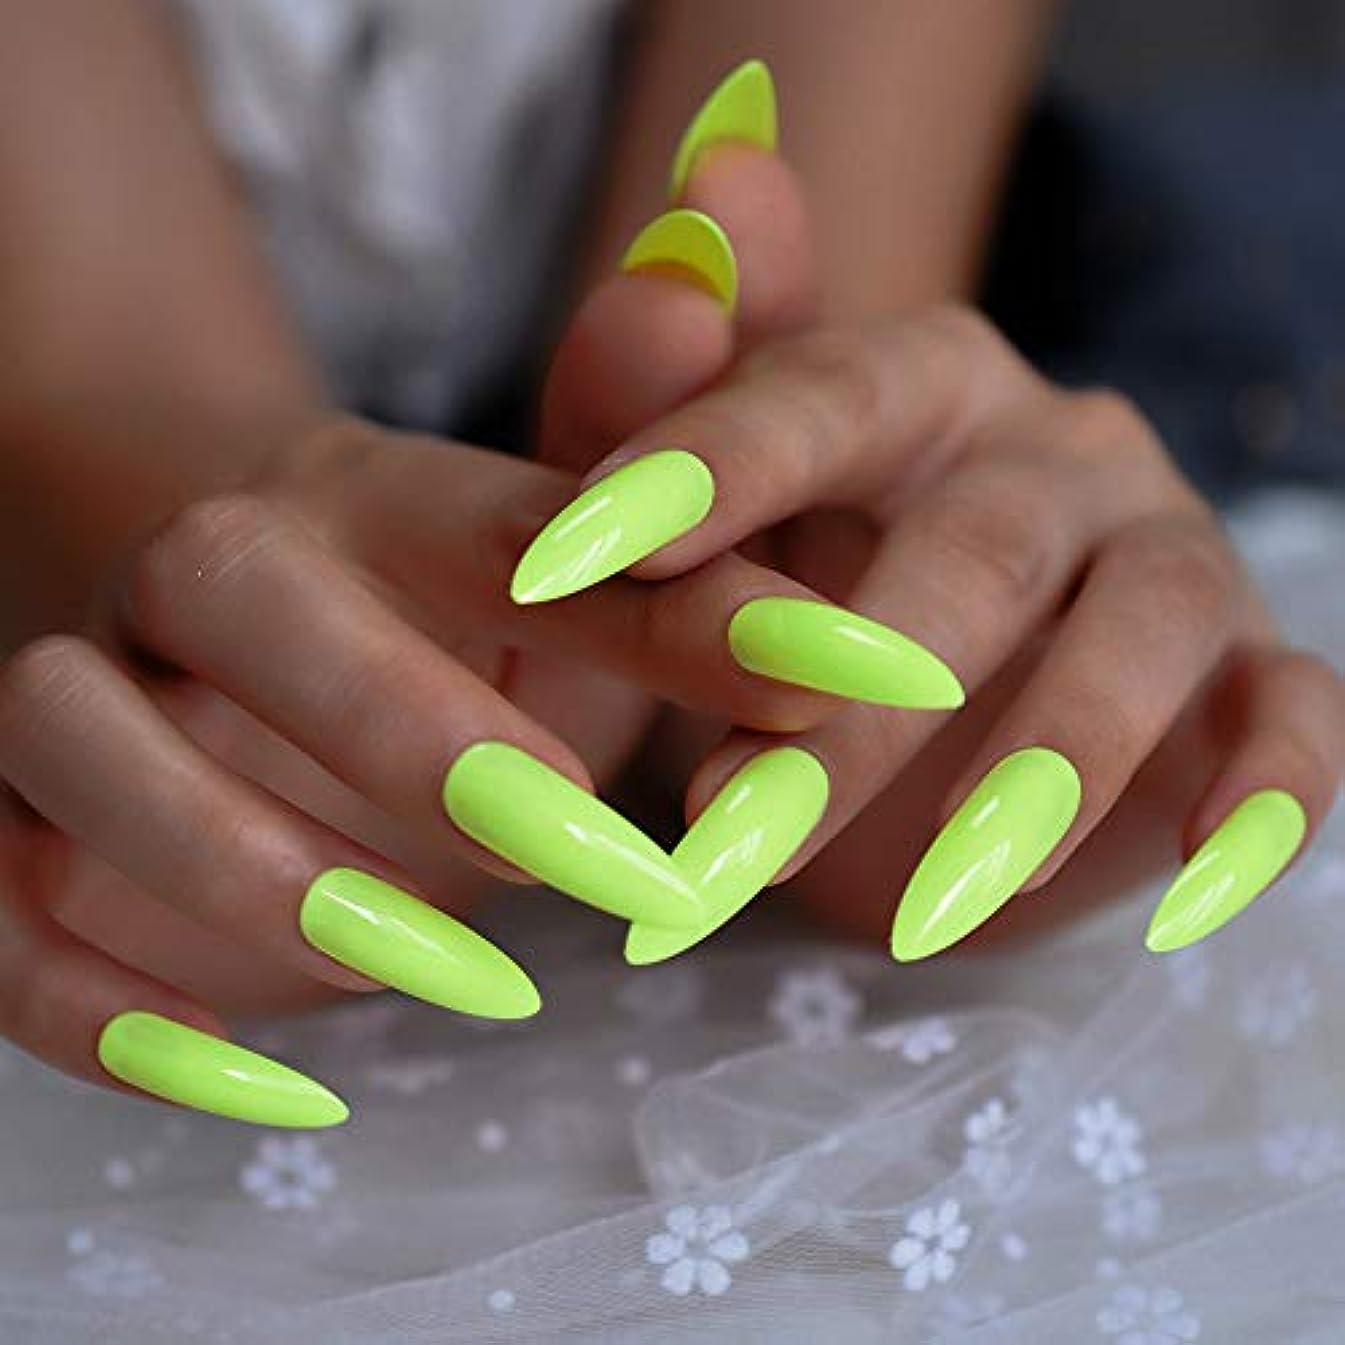 XUTXZKA 偽の指の爪に余分な長い指を指すグリーンプレス